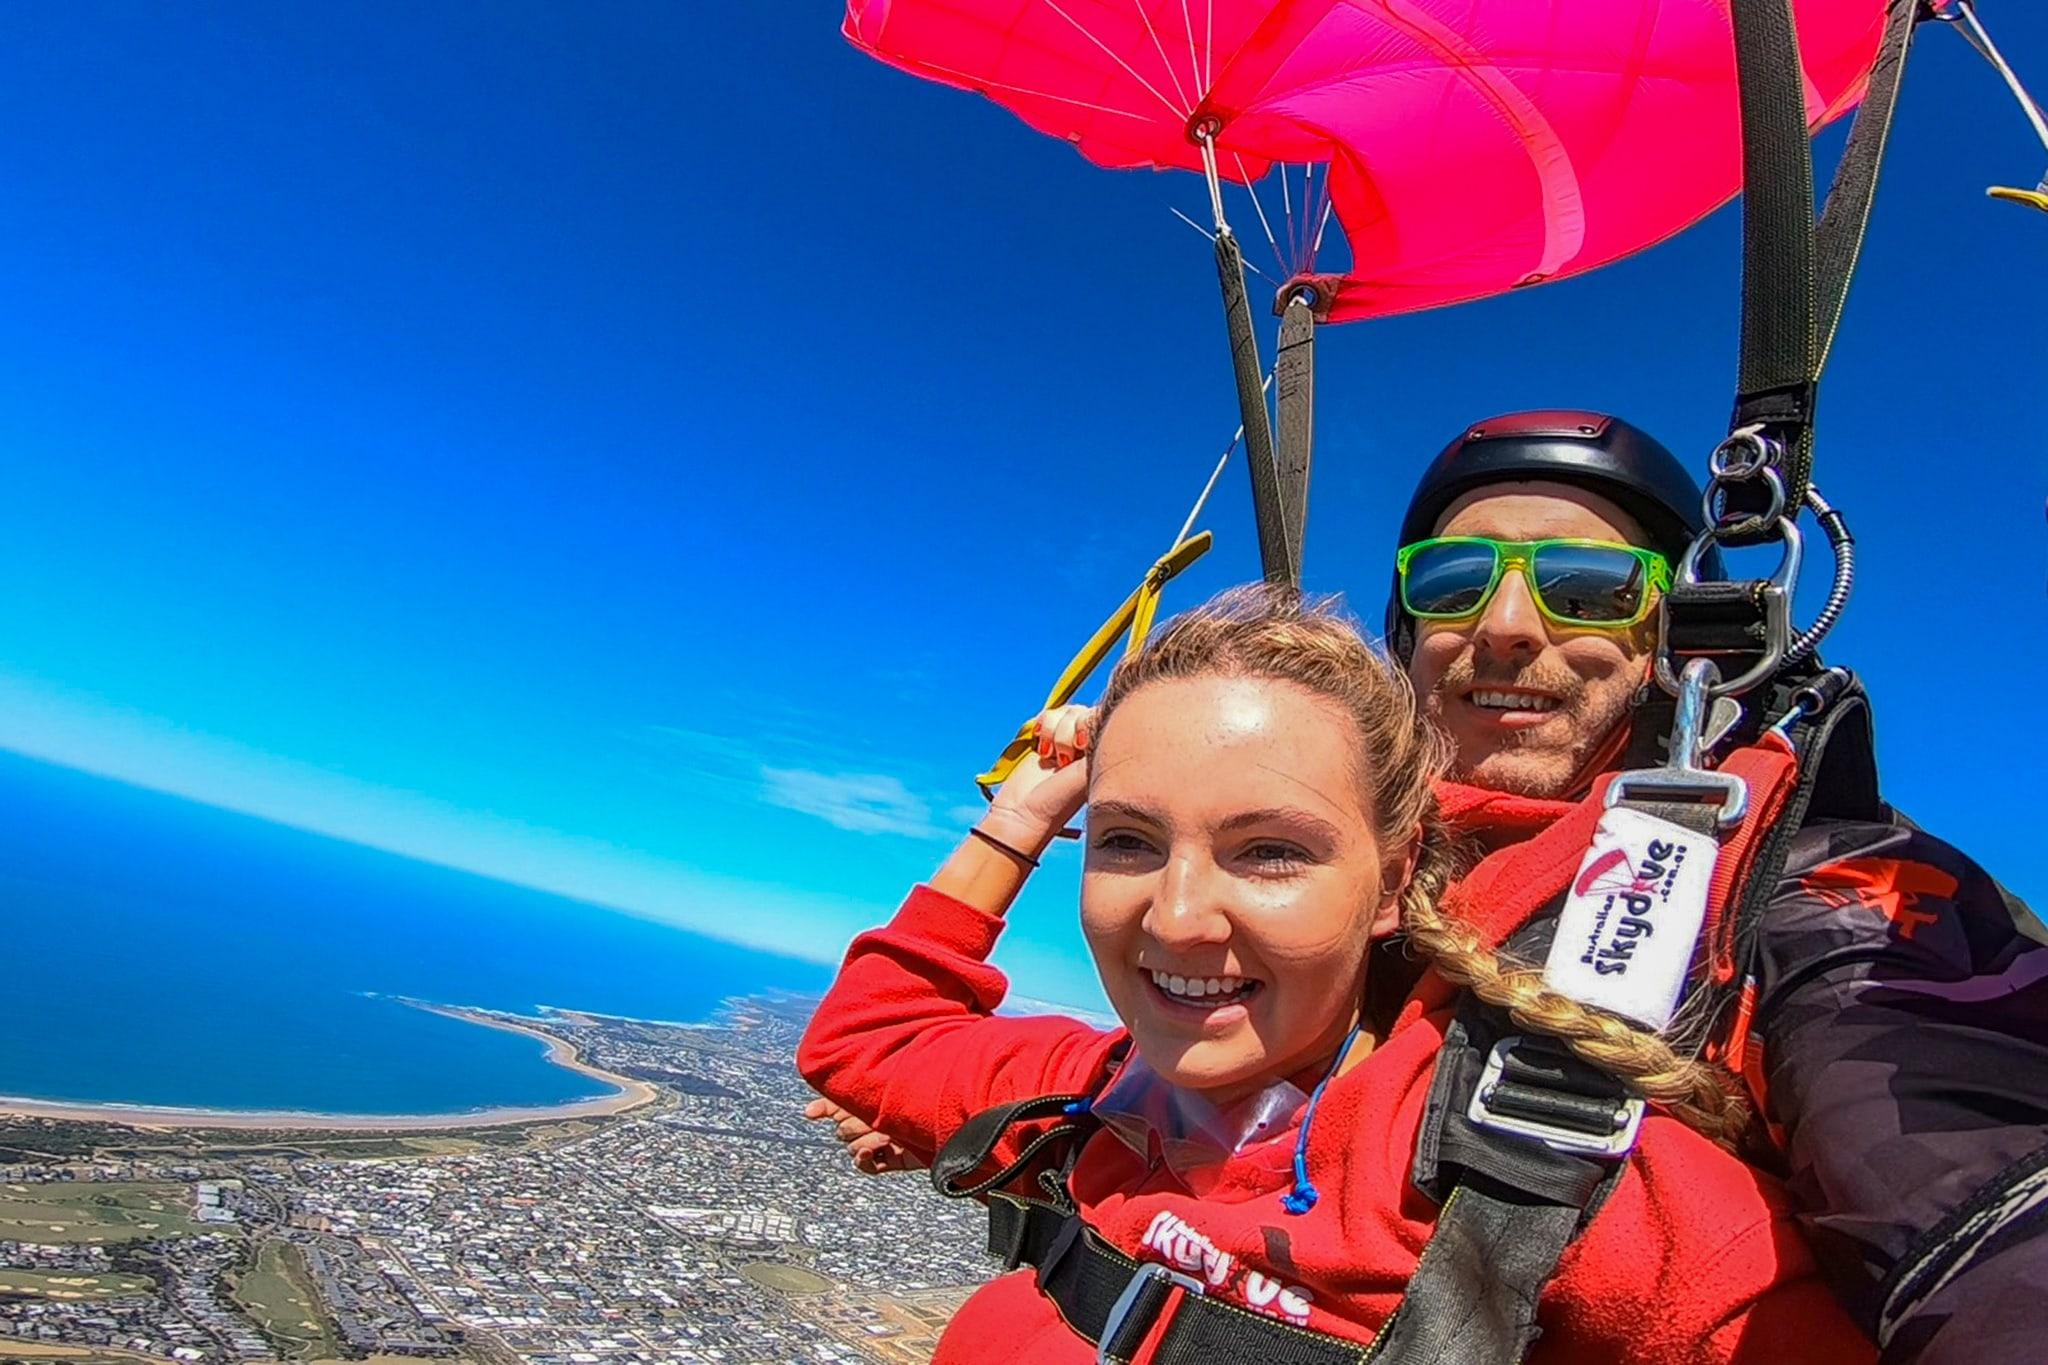 Skydiving Great Ocean Road (Torquay) - Tandem Skydive up to 15,000ft